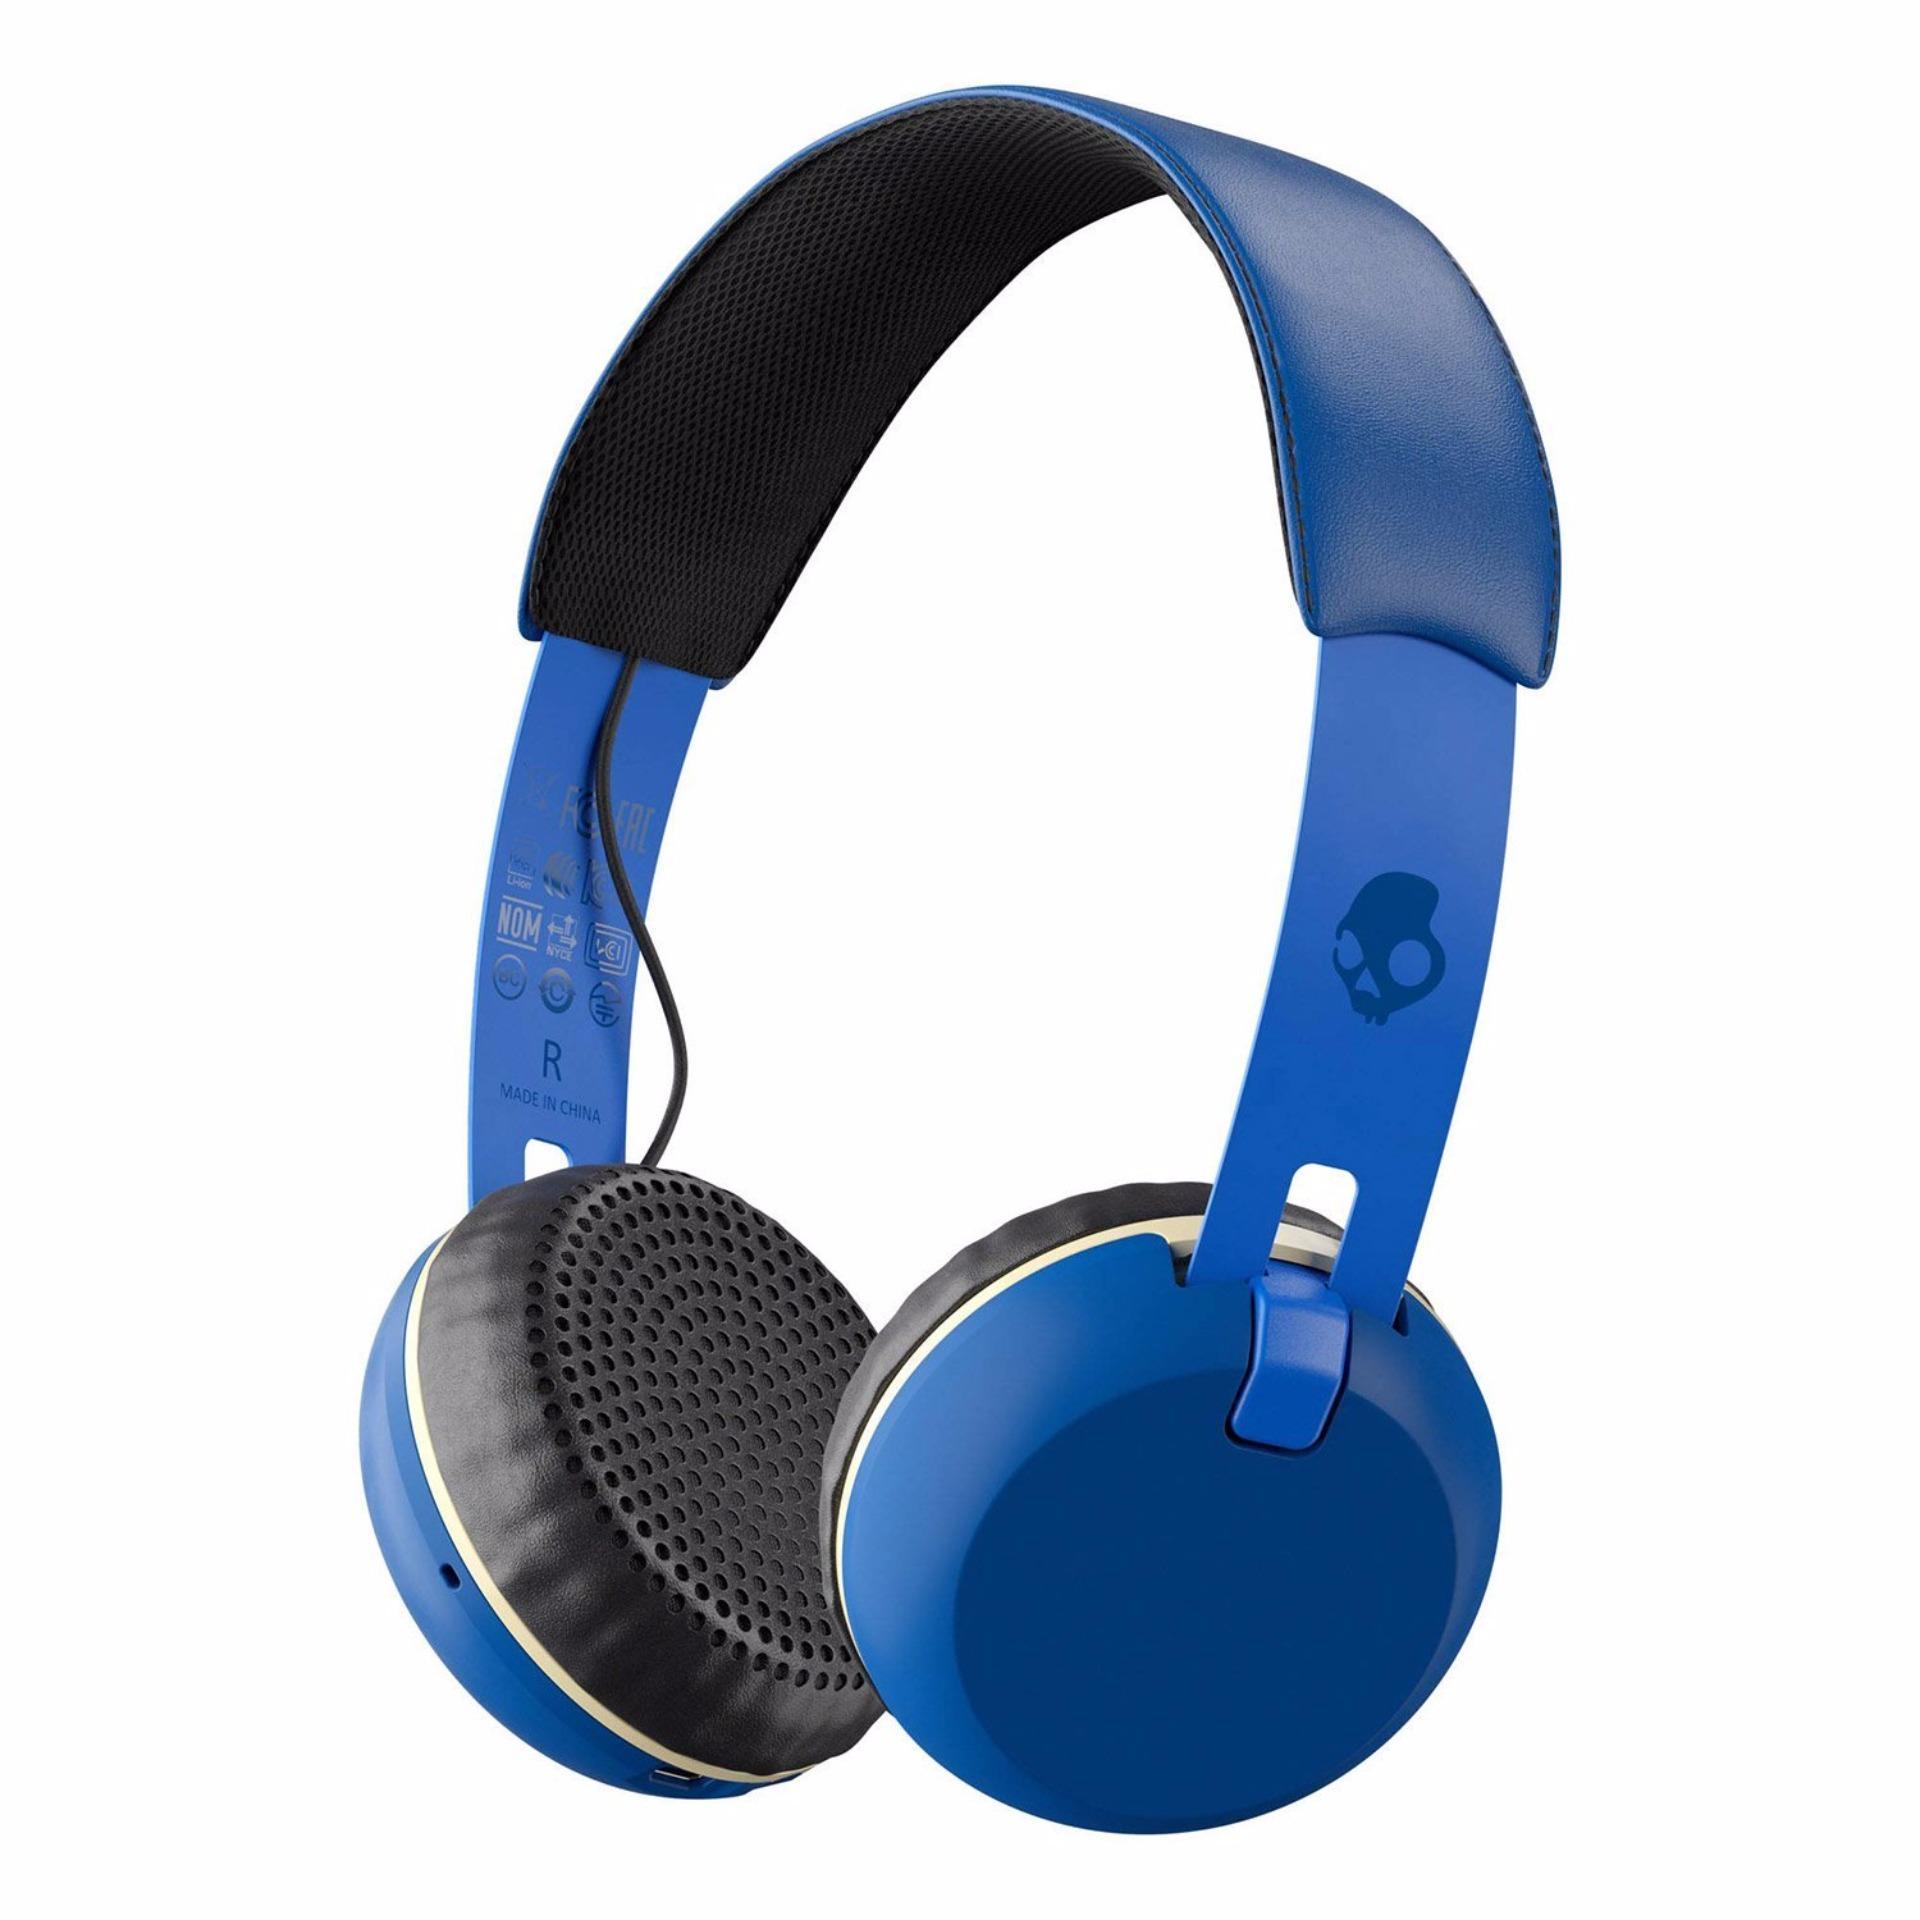 Tai Nghe On-Ear Không Dây Skullcandy Grind Wireless